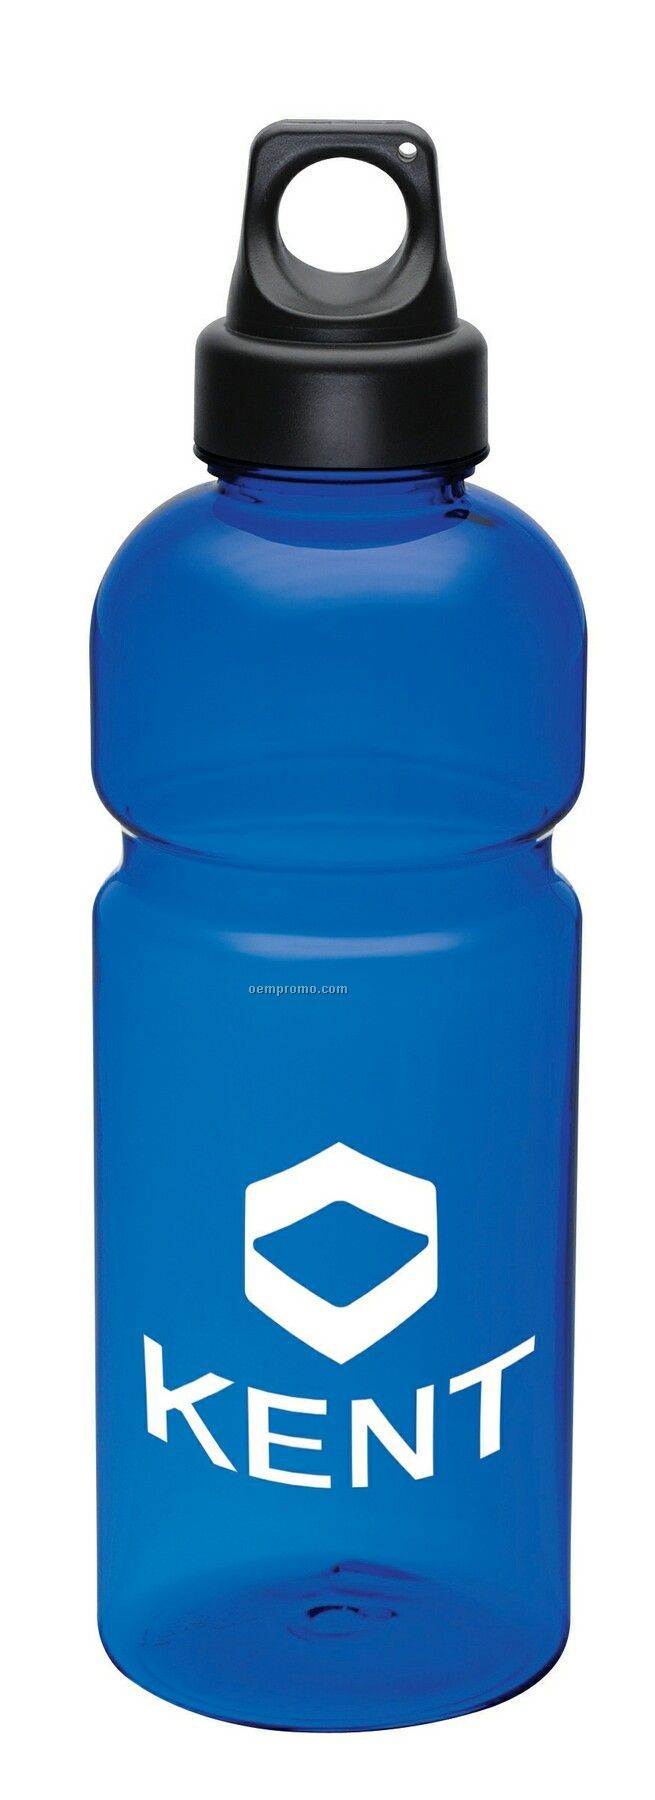 24 Oz. The Tournament Sports Bottle